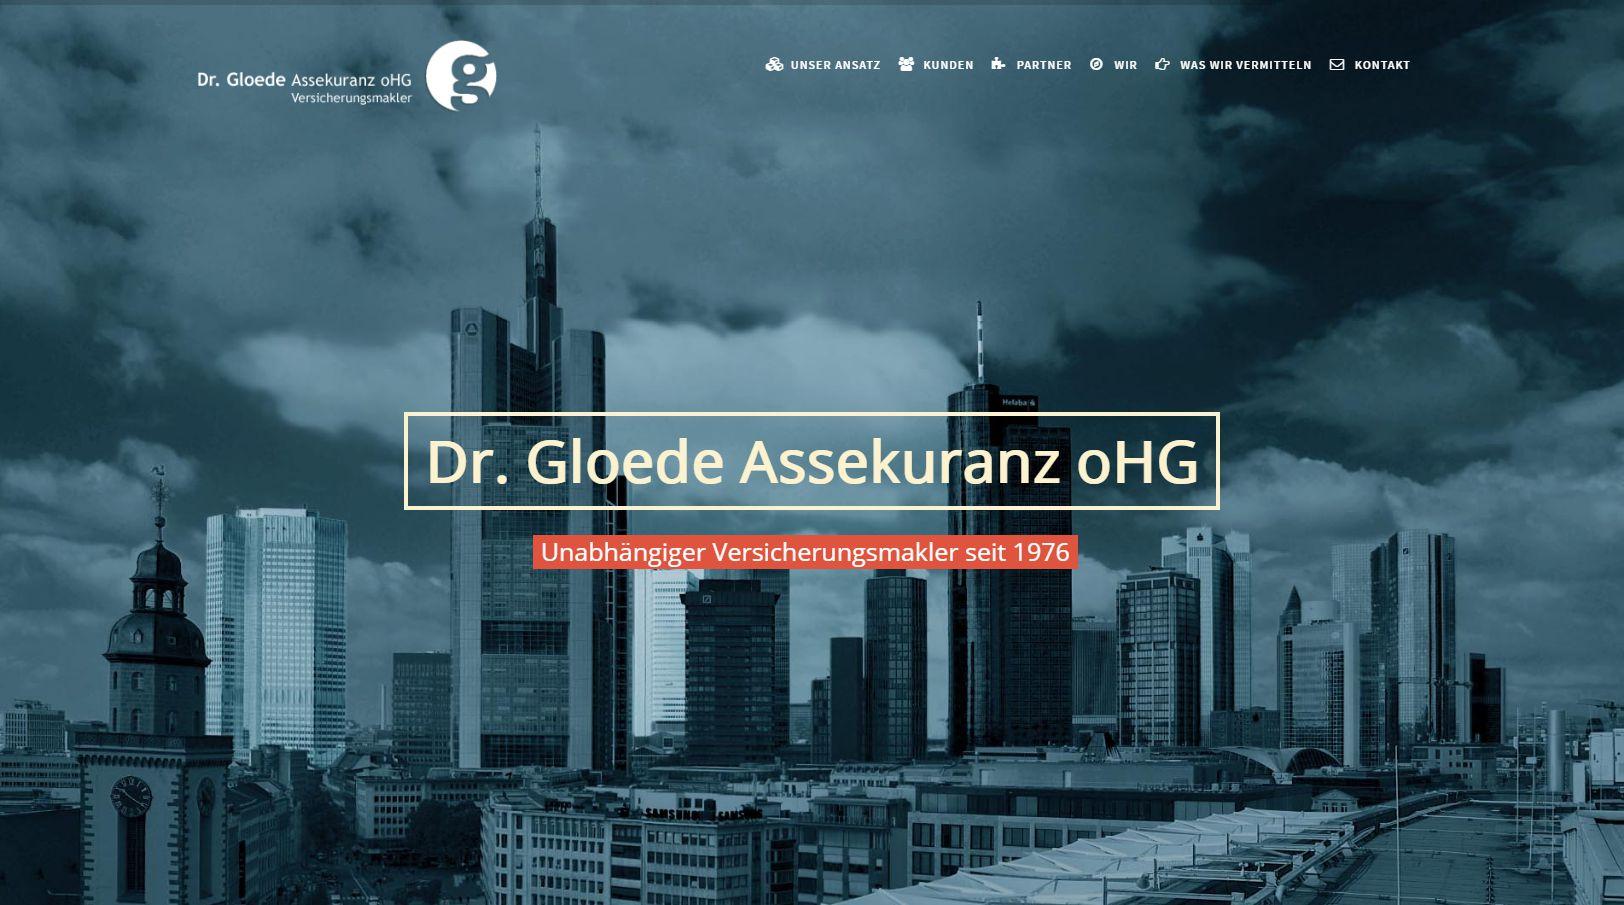 Dr Gloede - Assekuranz oHG Frankfurt am Main